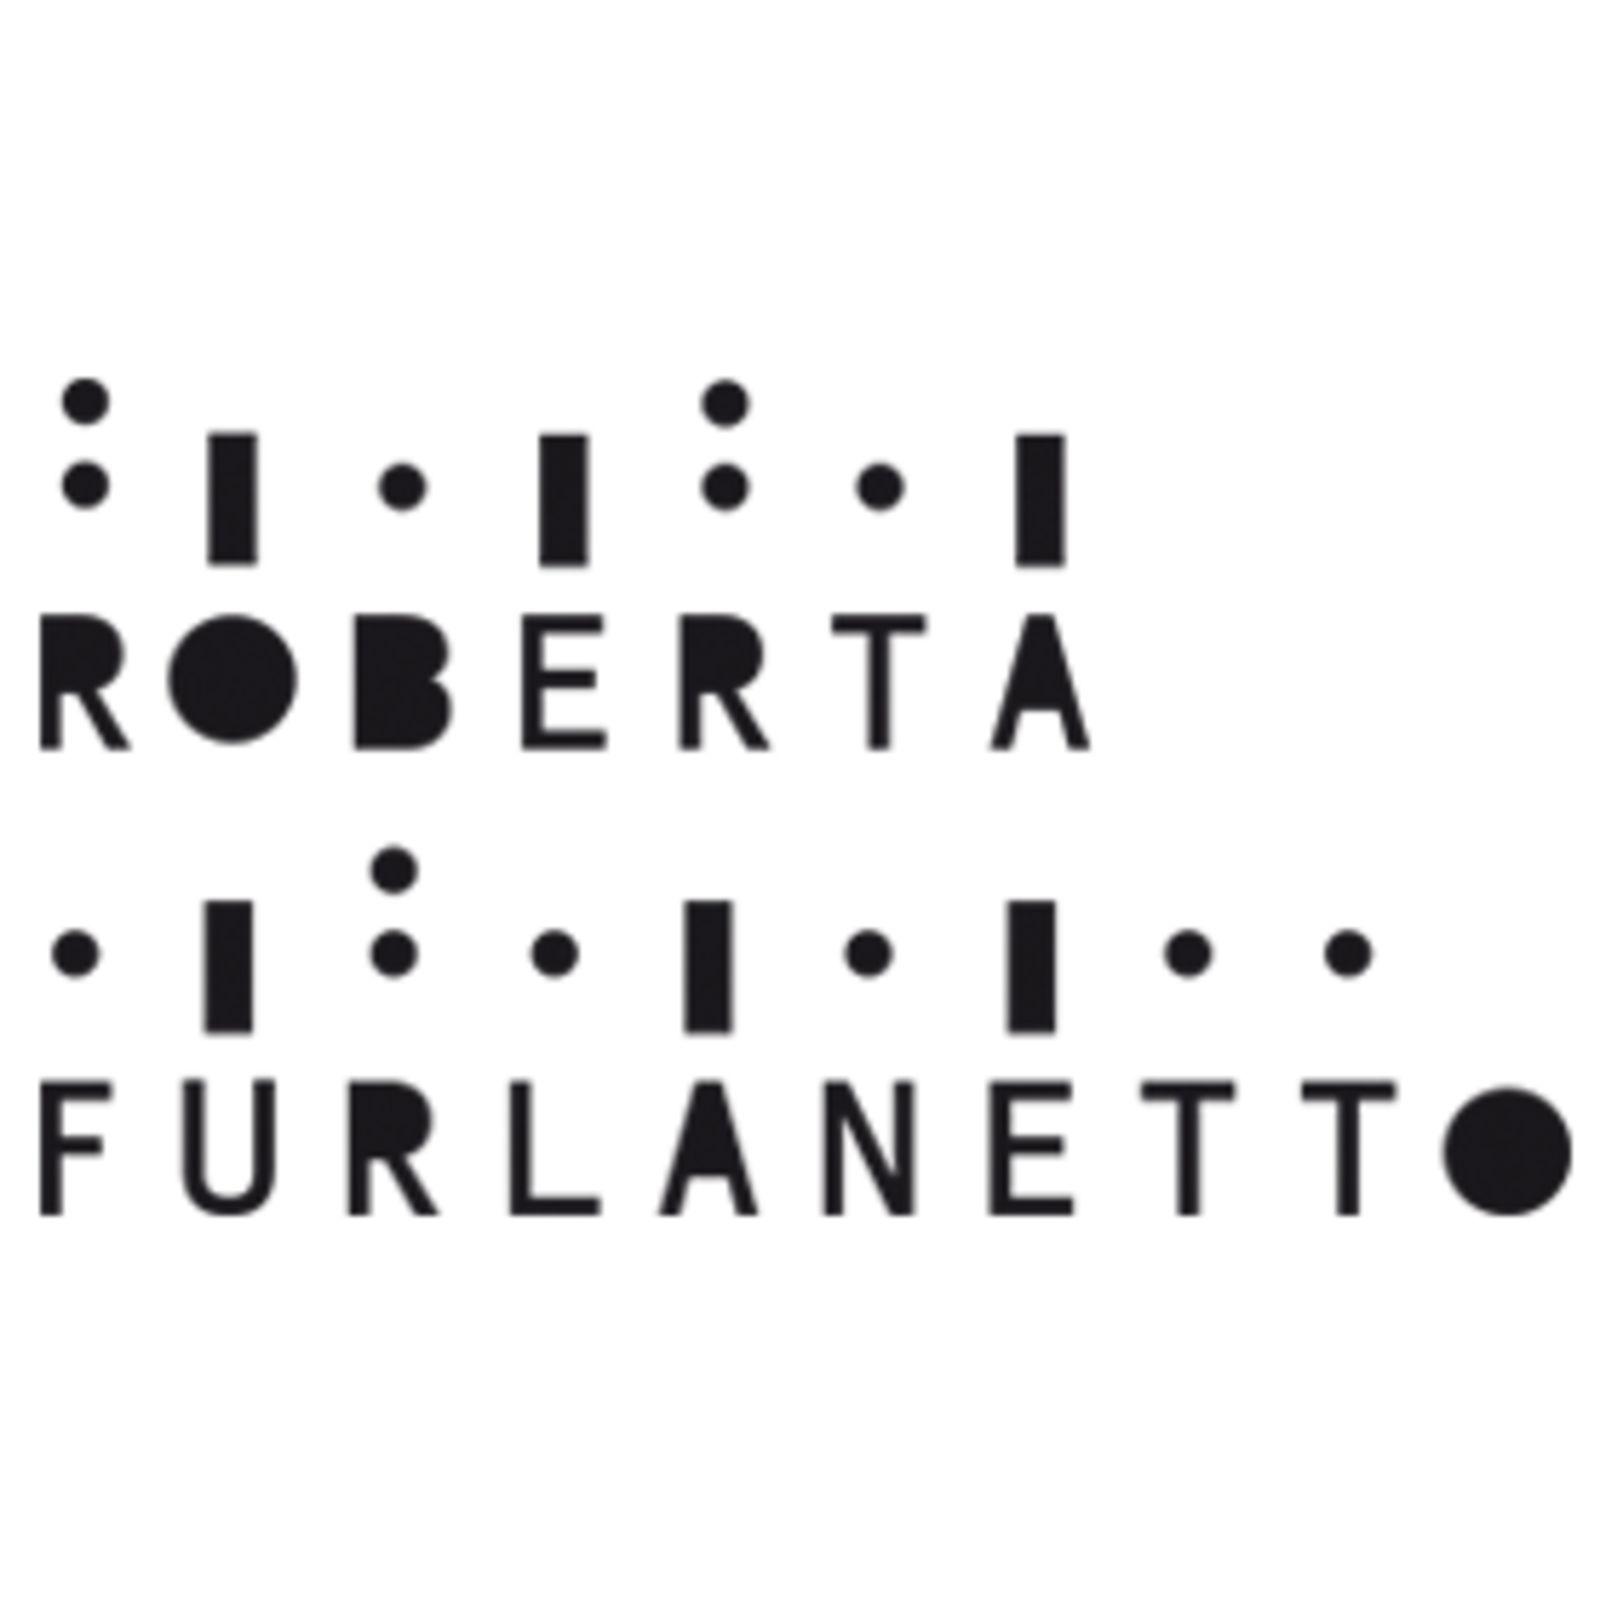 ROBERTA FURLANETTO